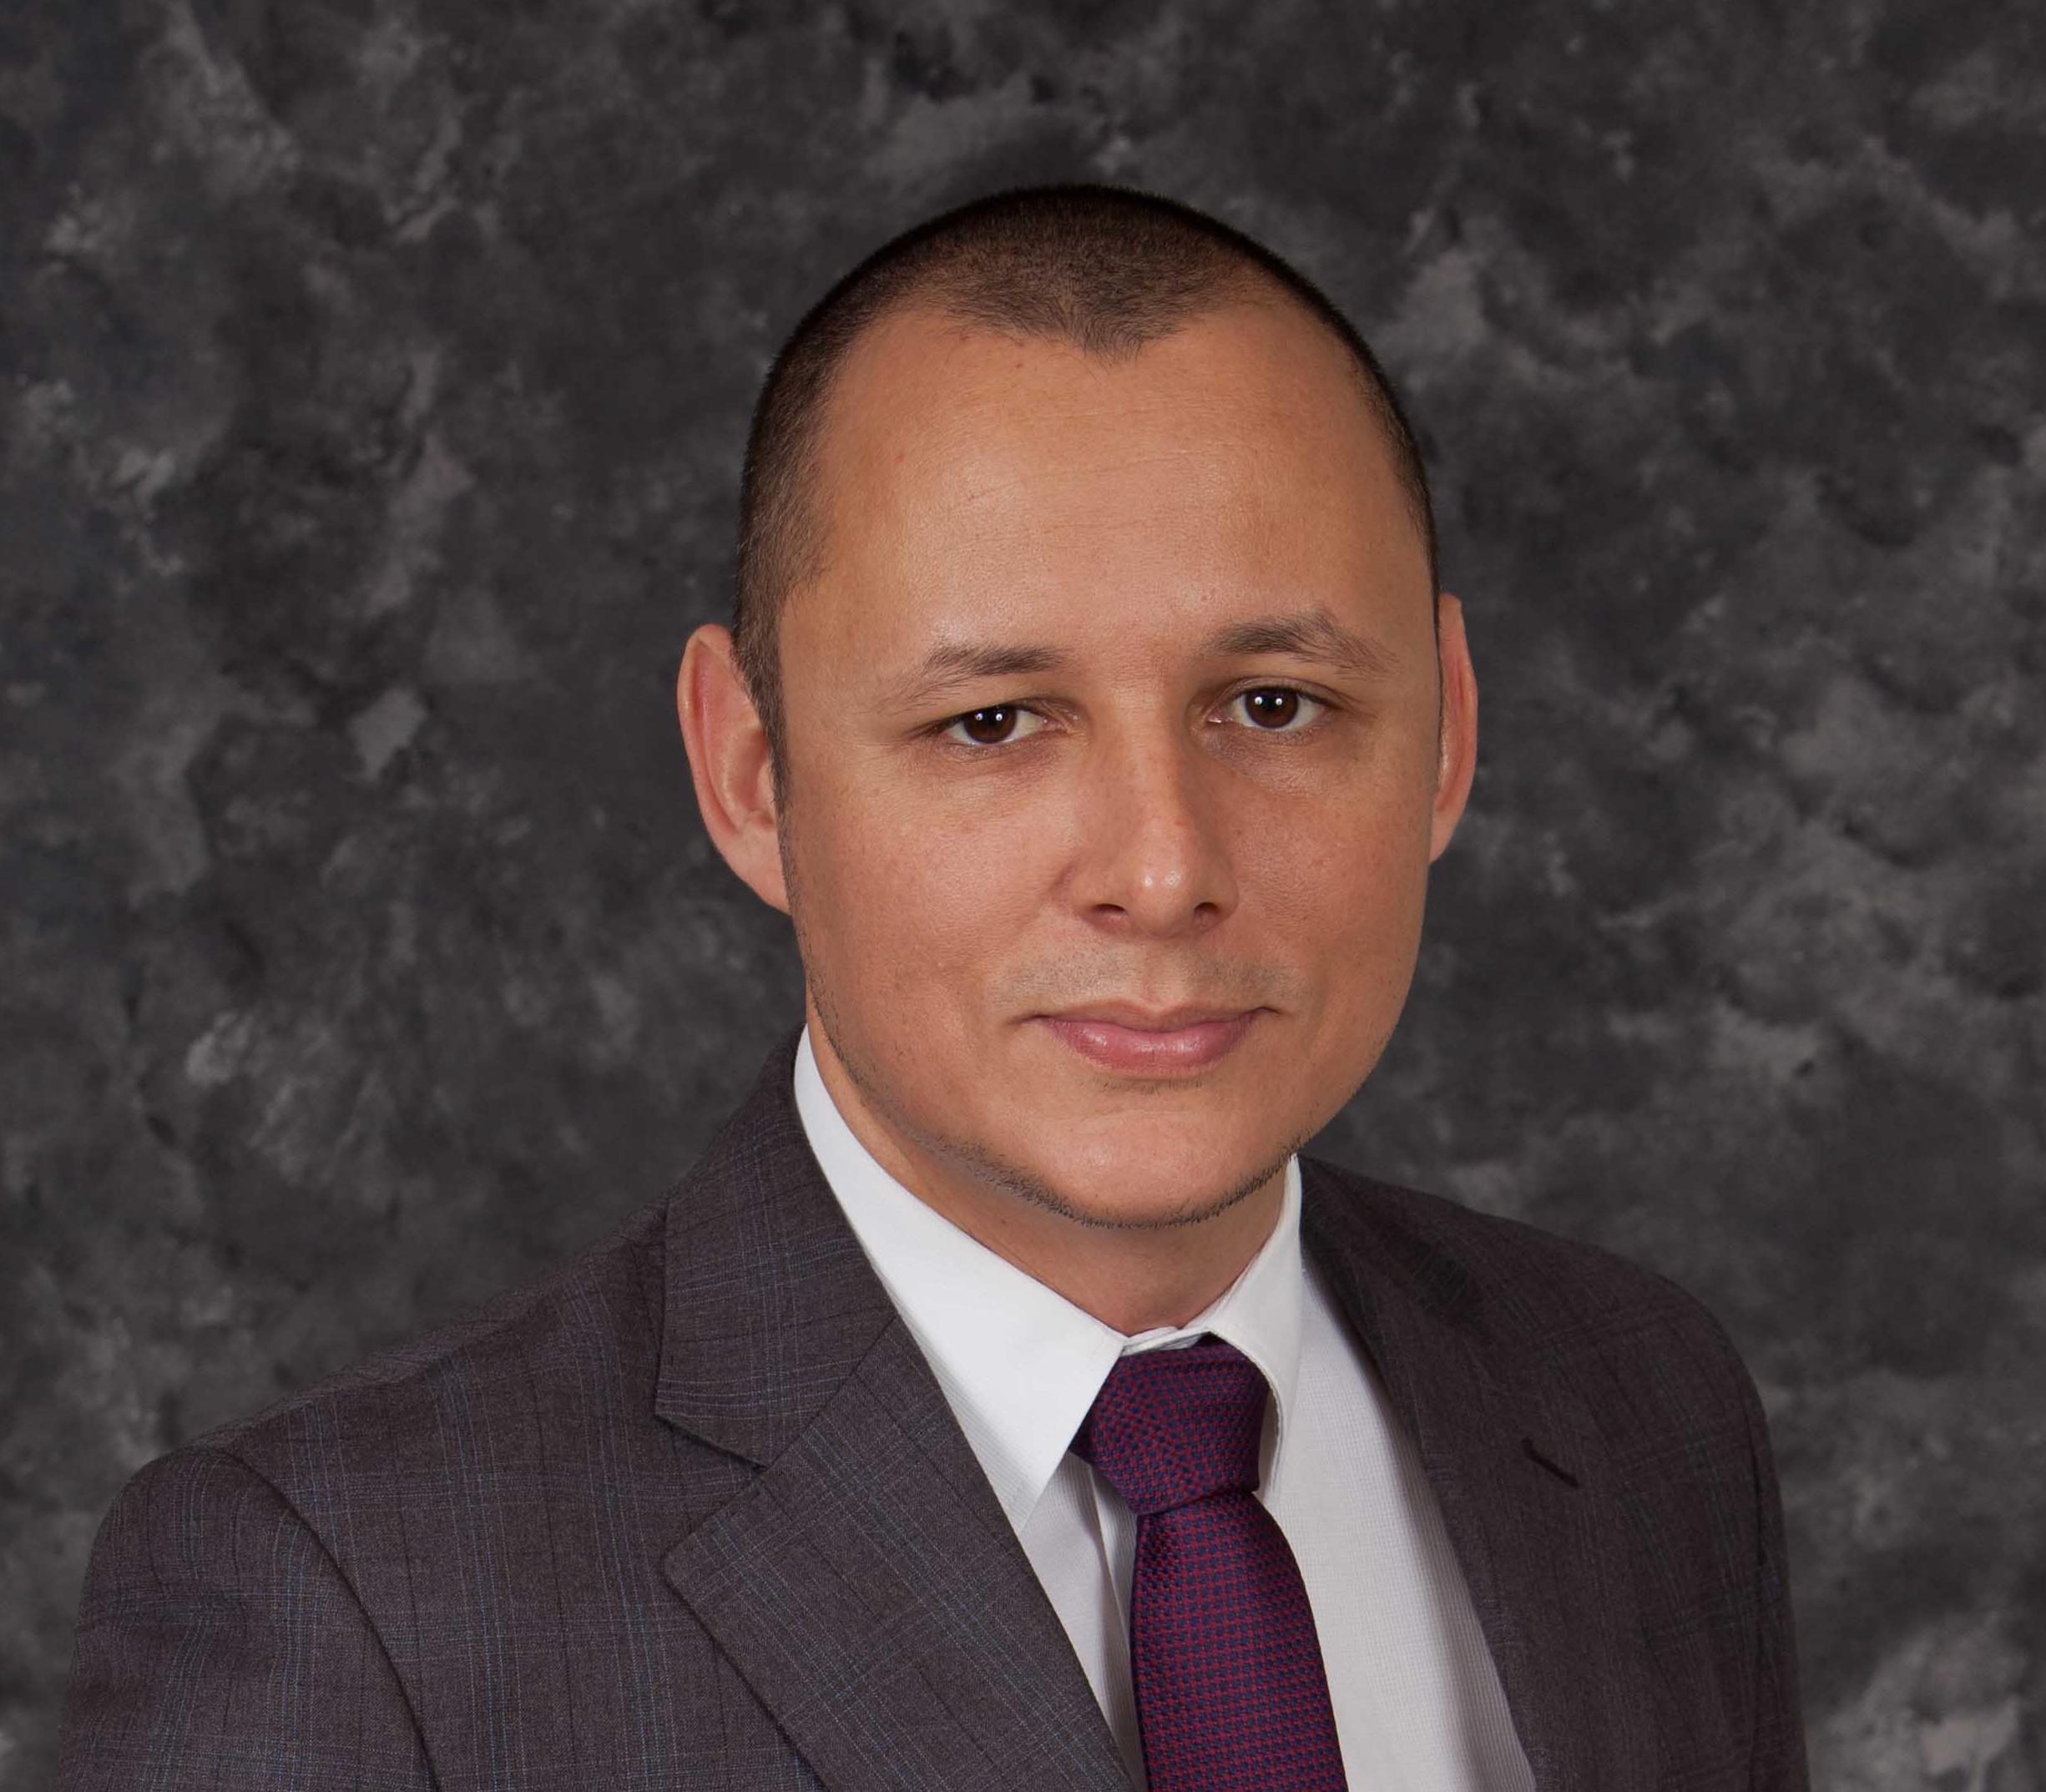 Ricardo Claro